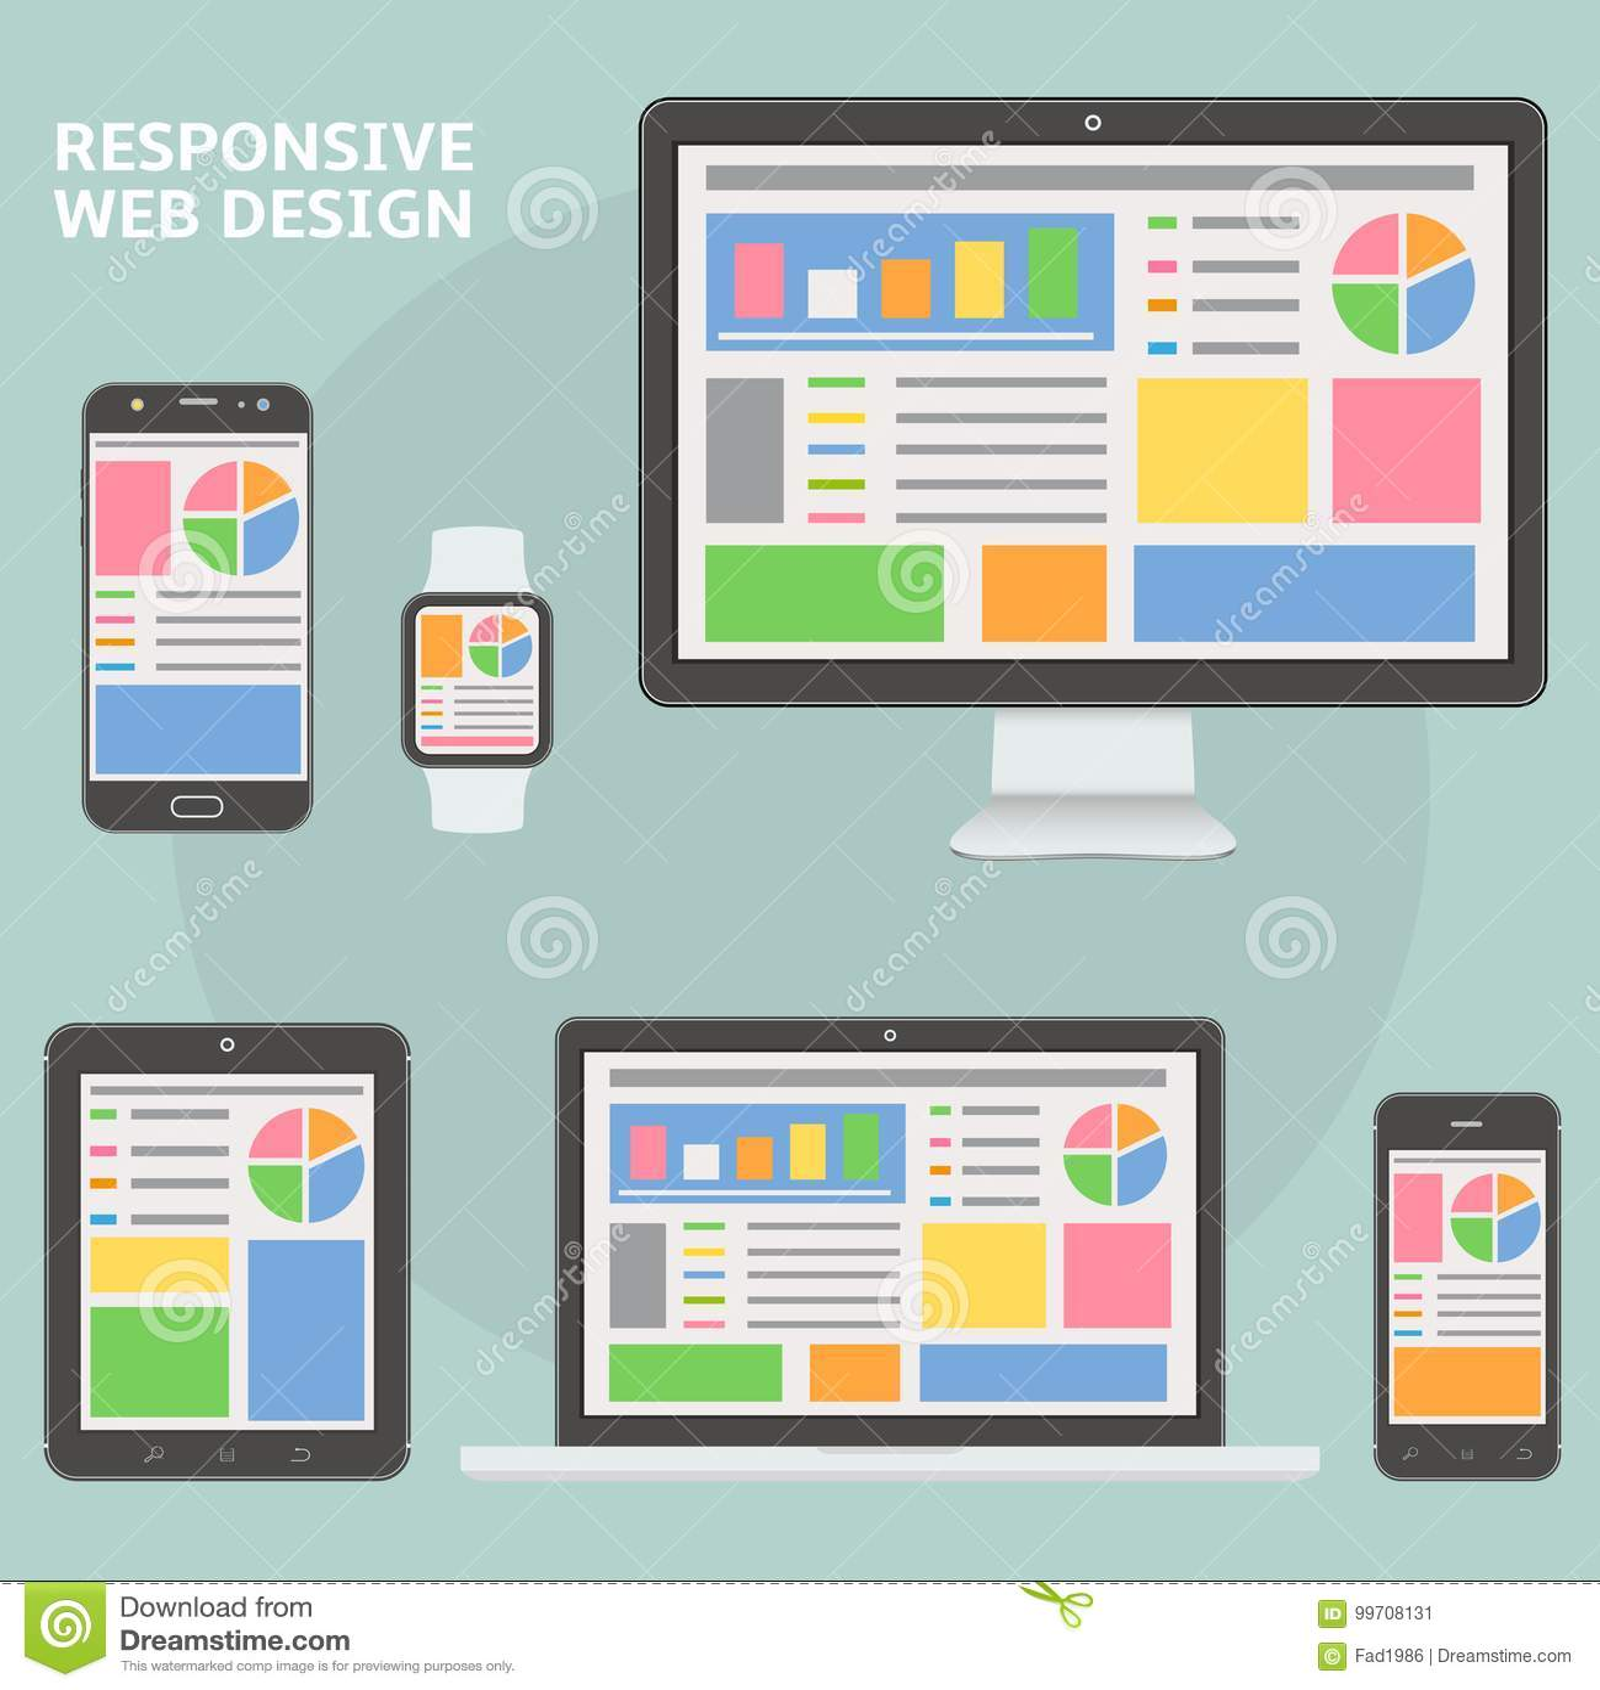 Flat Style Responsive Webdesign Technology Stock Vector: Responsive Web Design Flat Style Devices Stock Vector